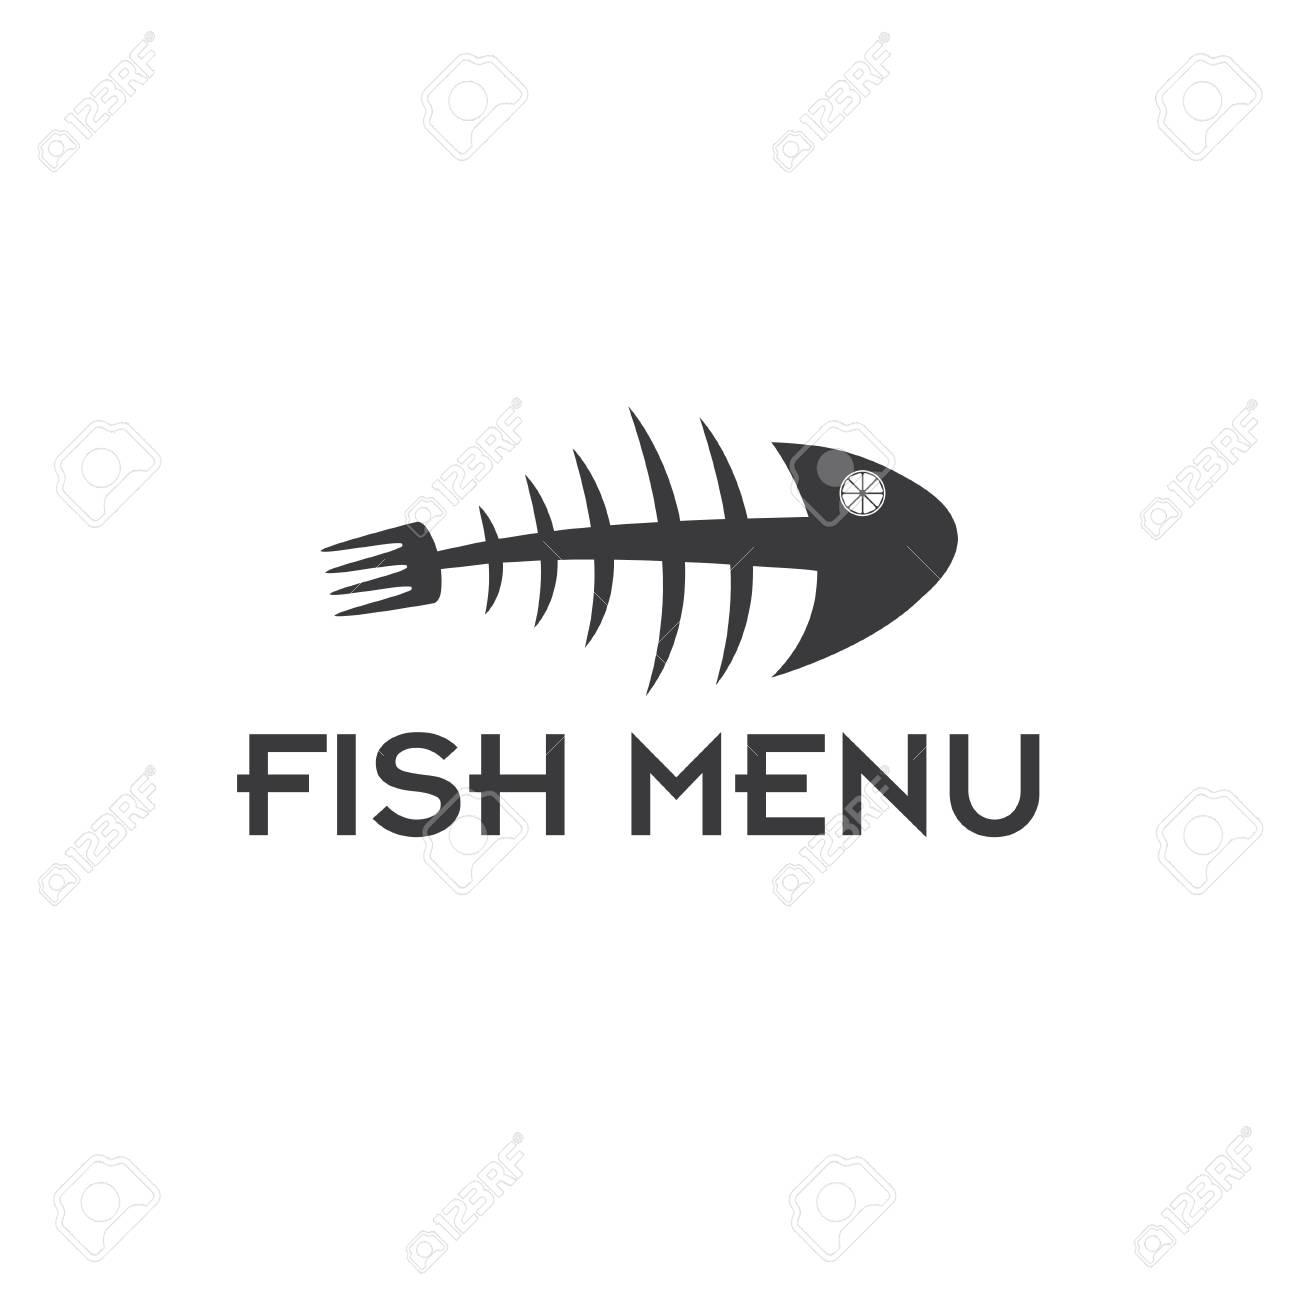 Fish Menu Vector Design Template Royalty Free Cliparts Vectors And